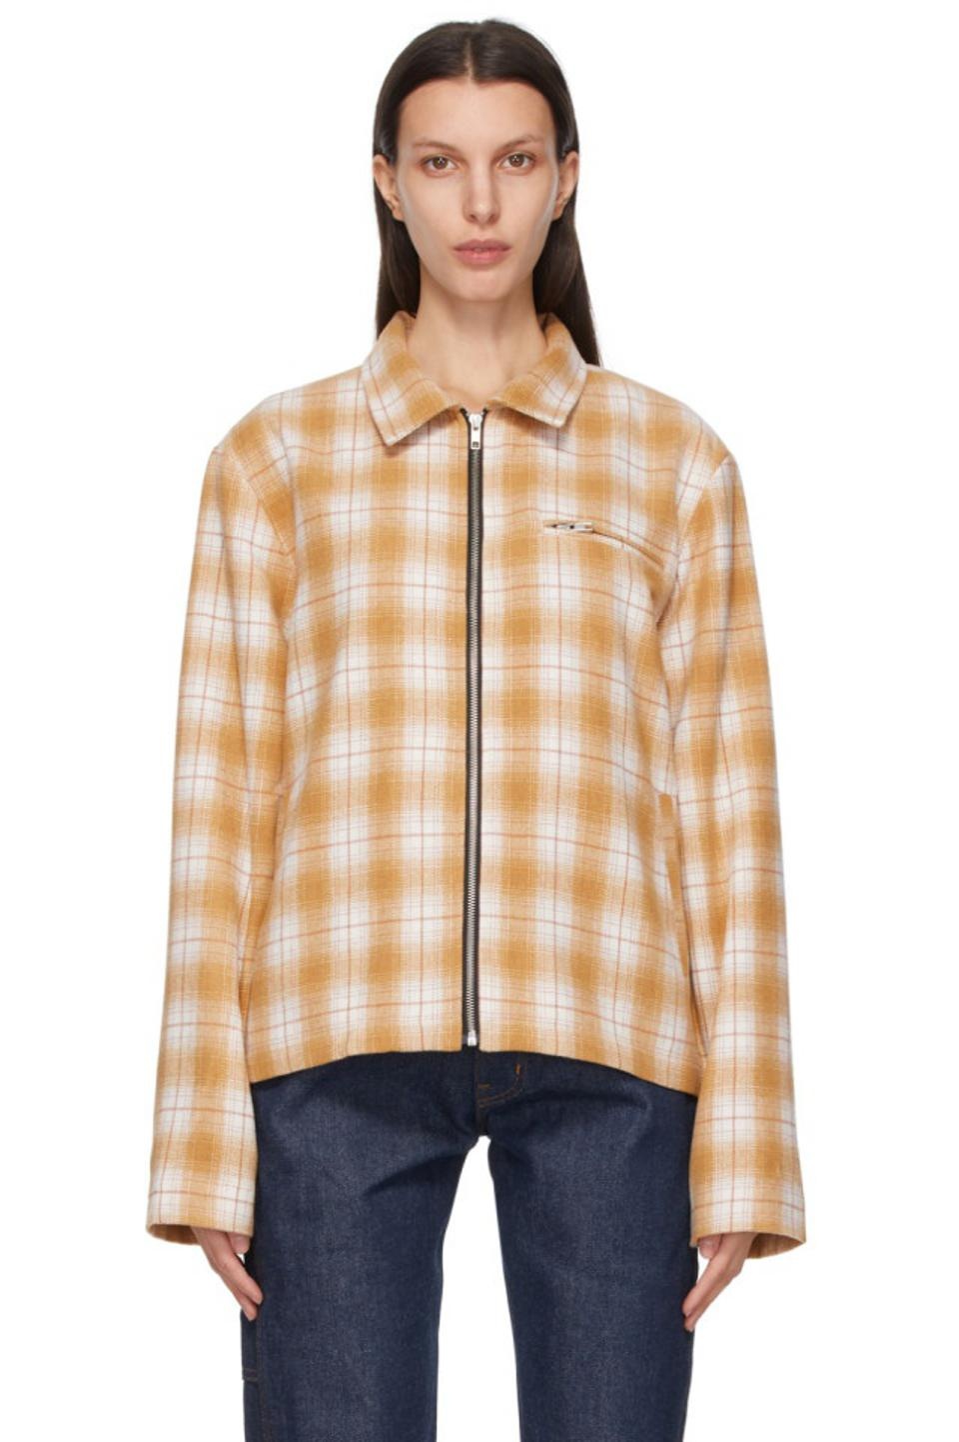 Noon Goons: Brown Check Anderson Jacket